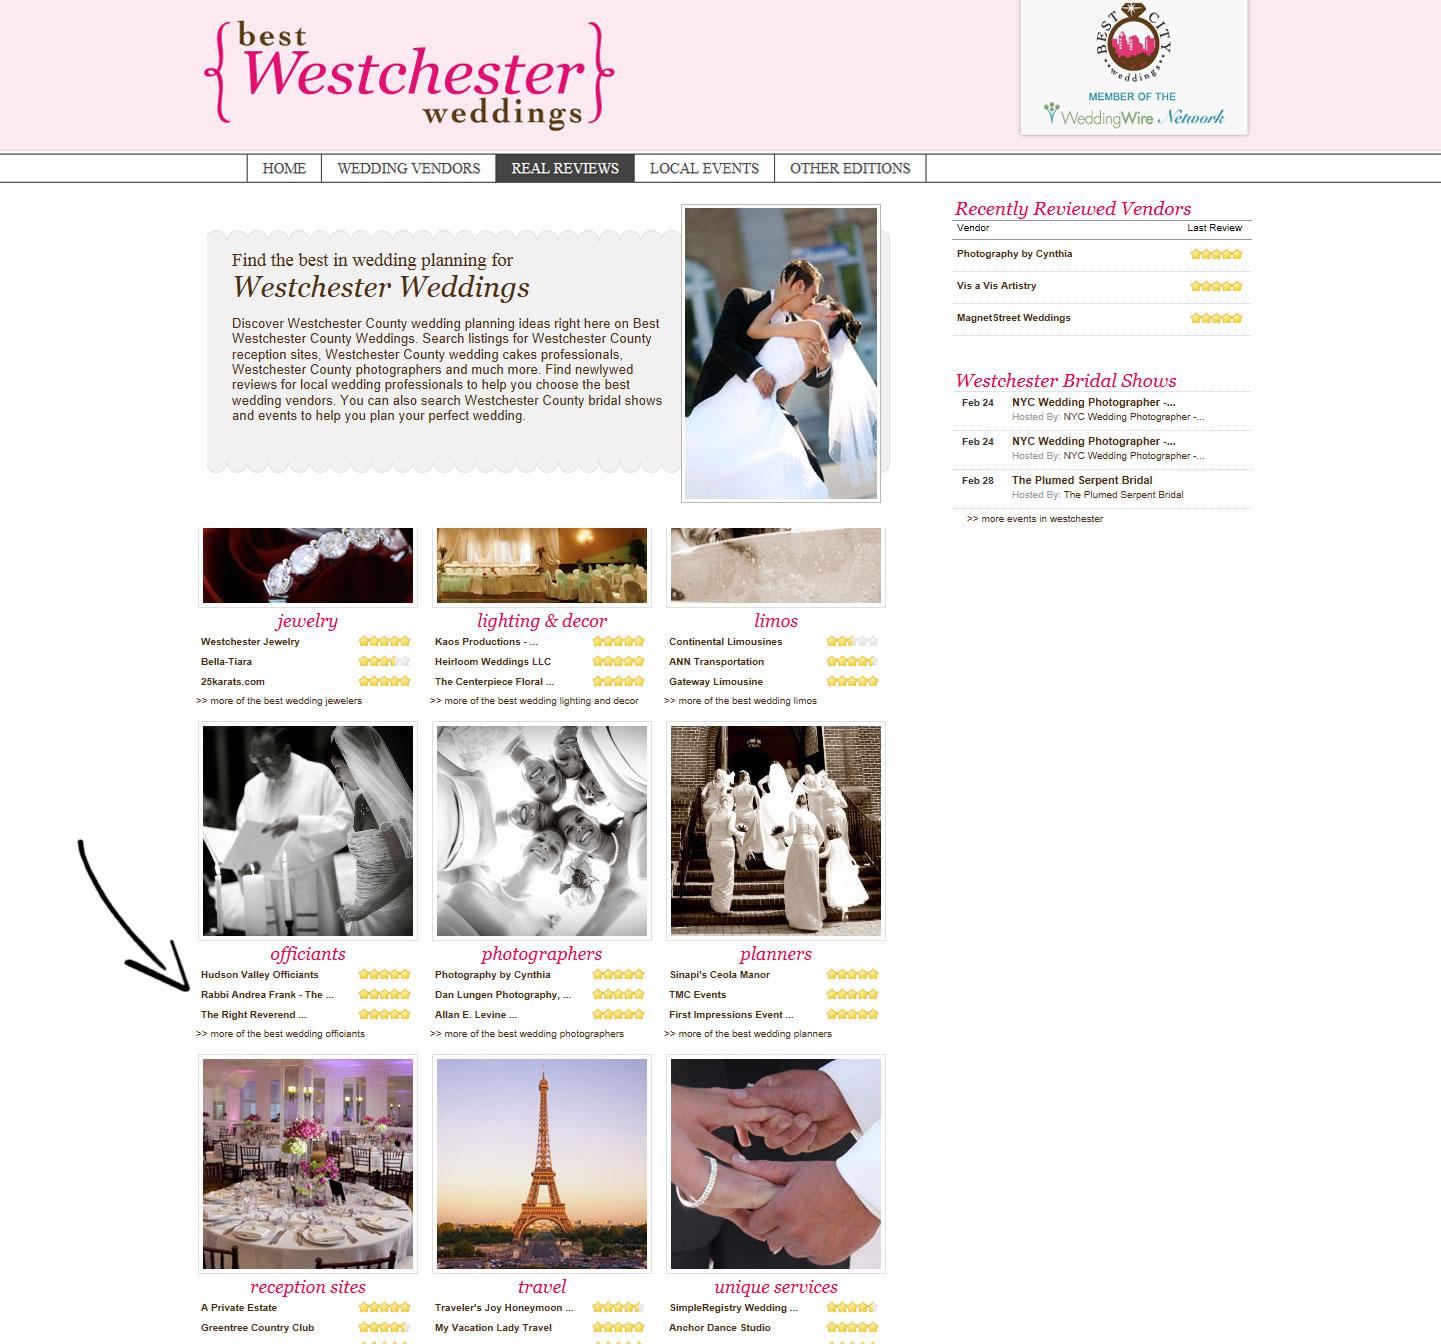 best-westchester-weddings